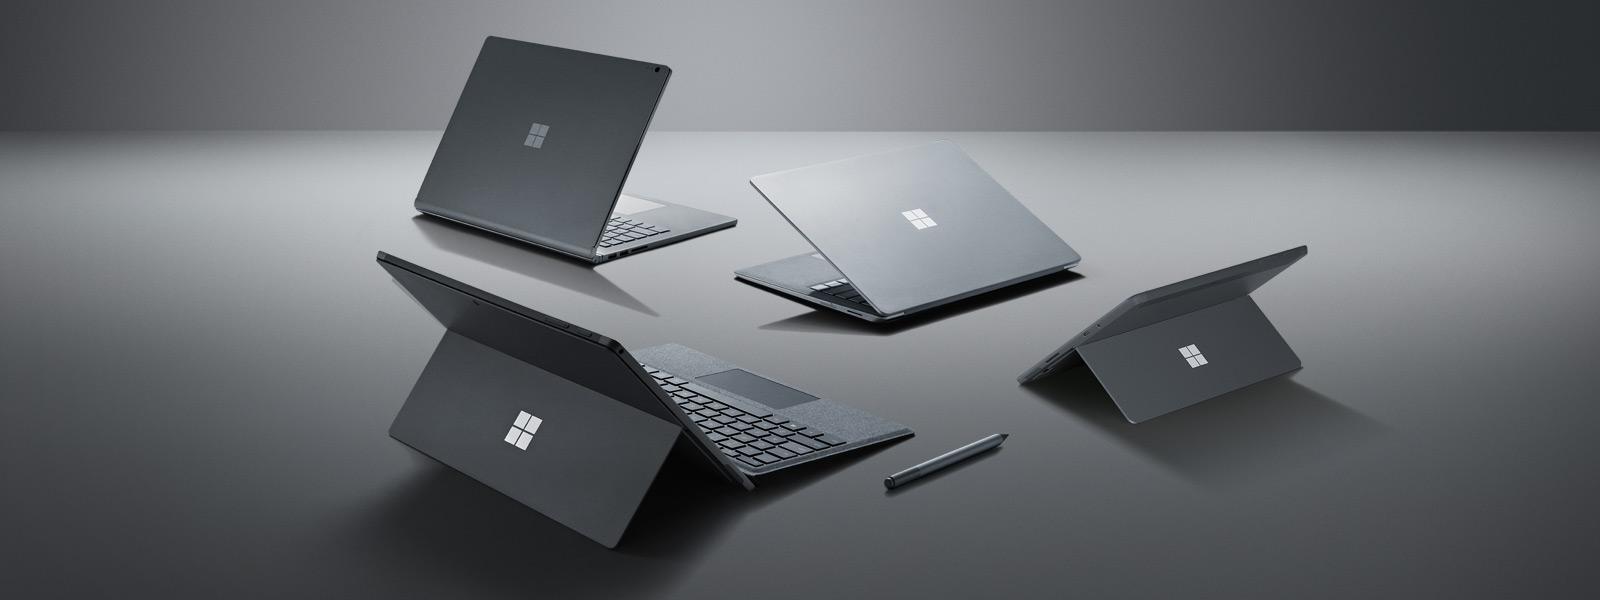 Surface Laptop 2, Surface Pro 6, Surface Go